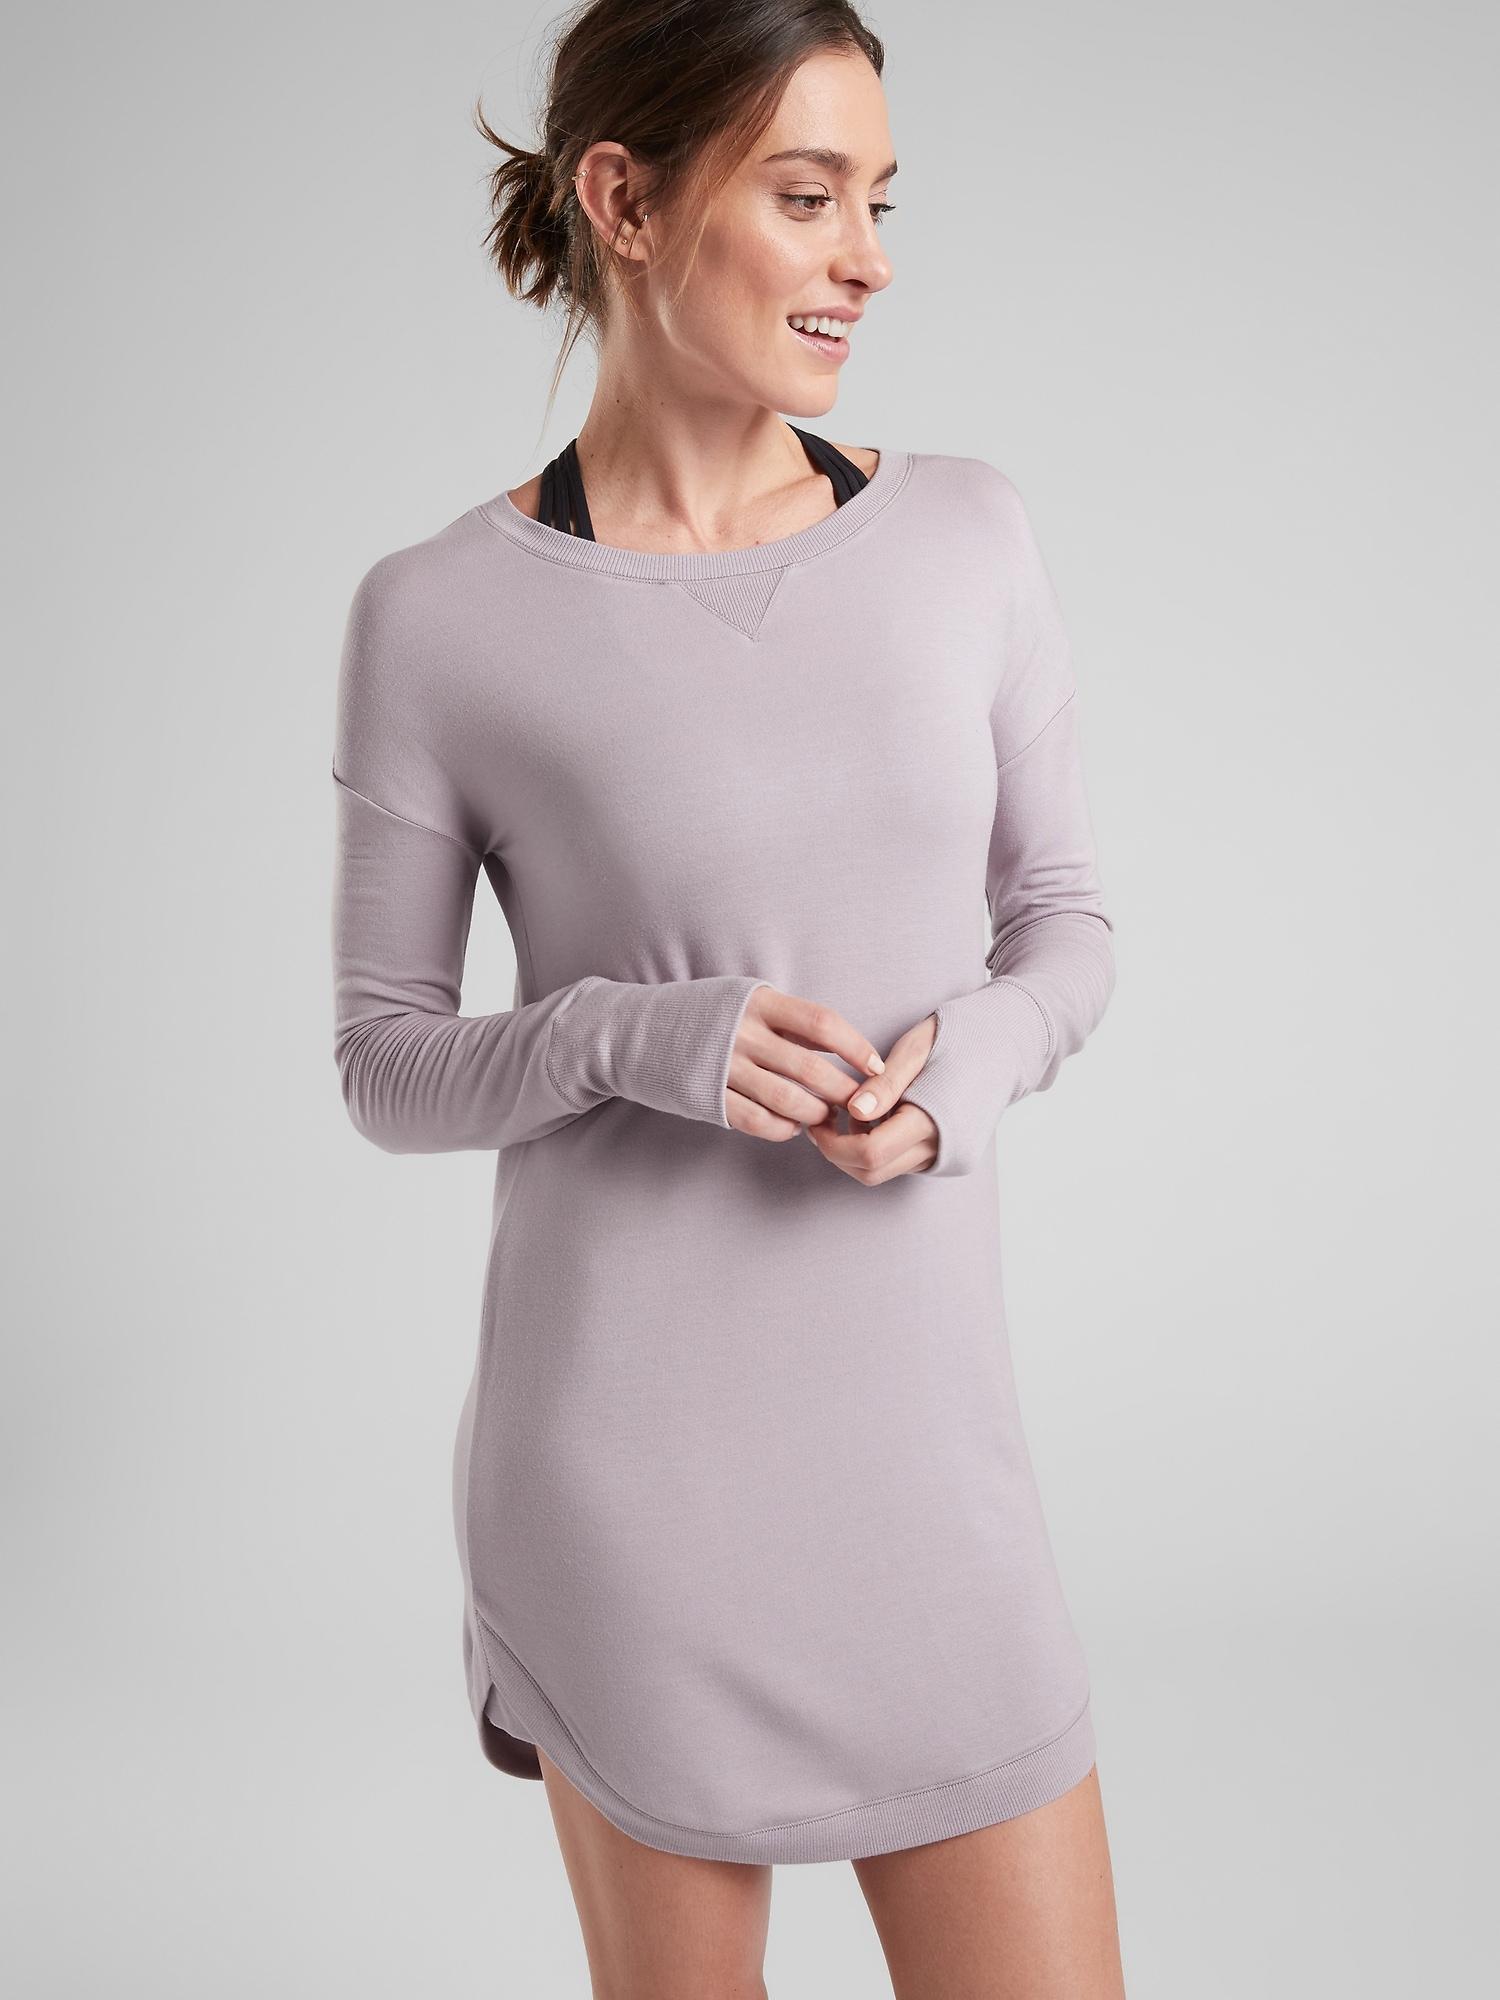 aae3d8602a1 Lyst - Athleta Recharge Sweatshirt Dress in Gray